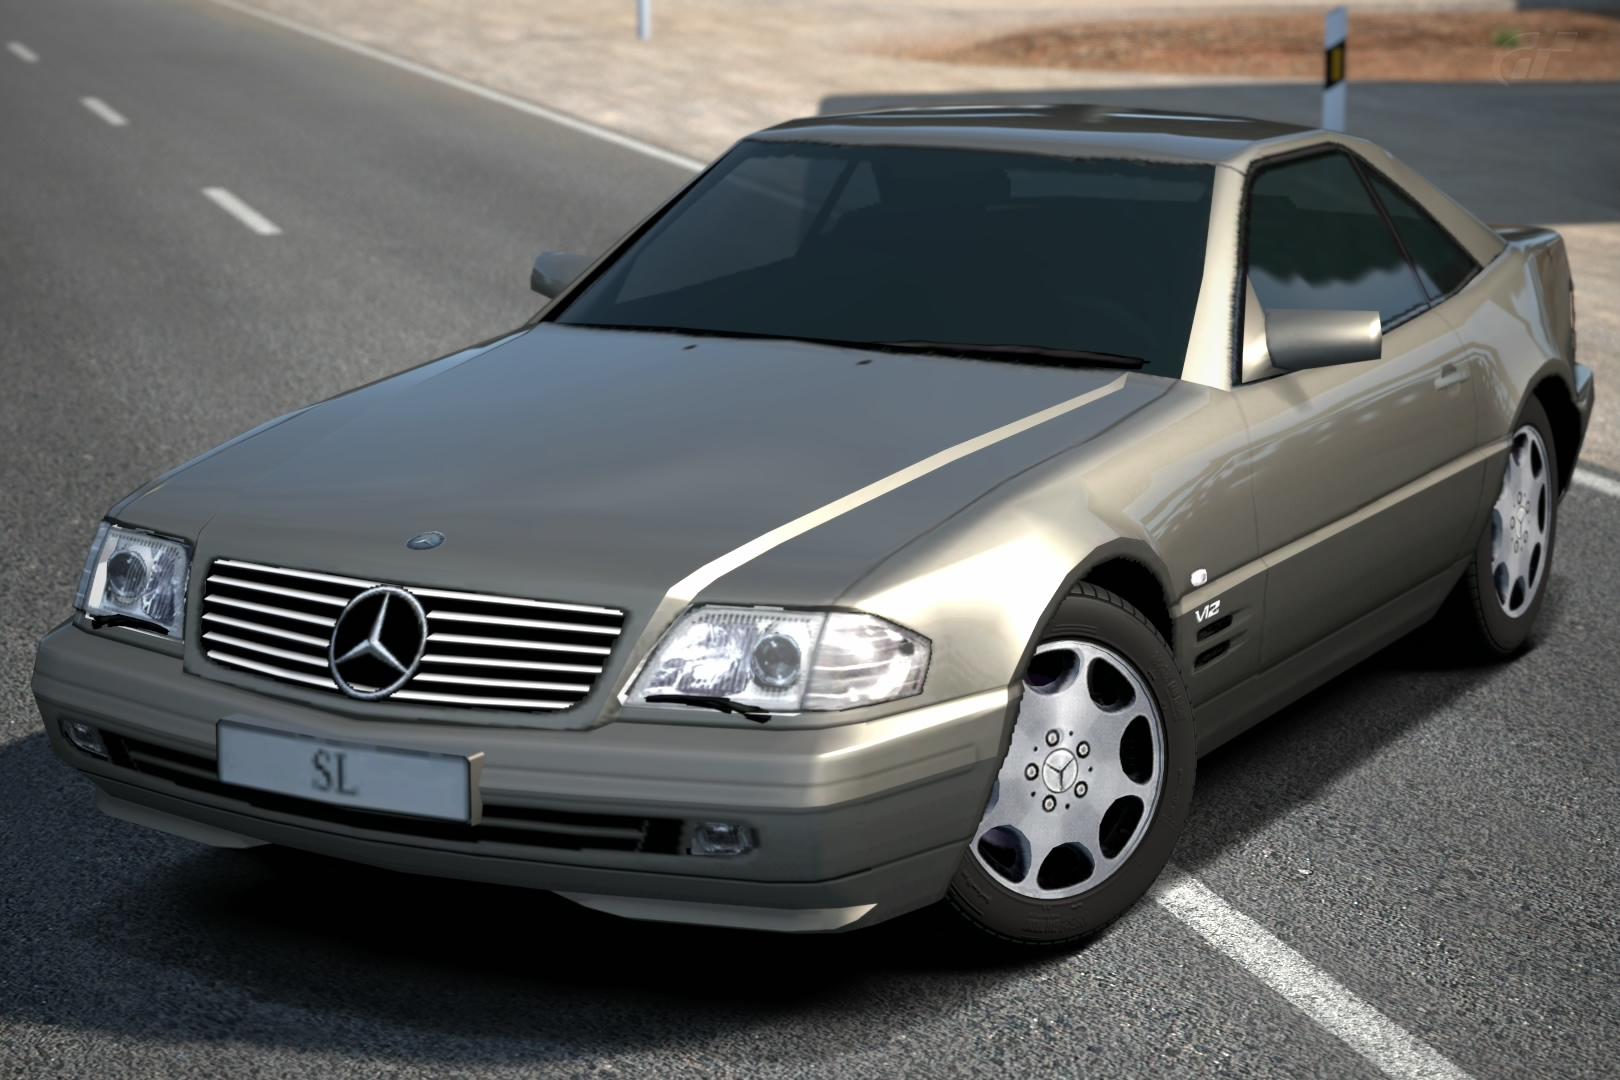 Mercedes-Benz SL 600 (R129) '98 | Gran Turismo Wiki ...